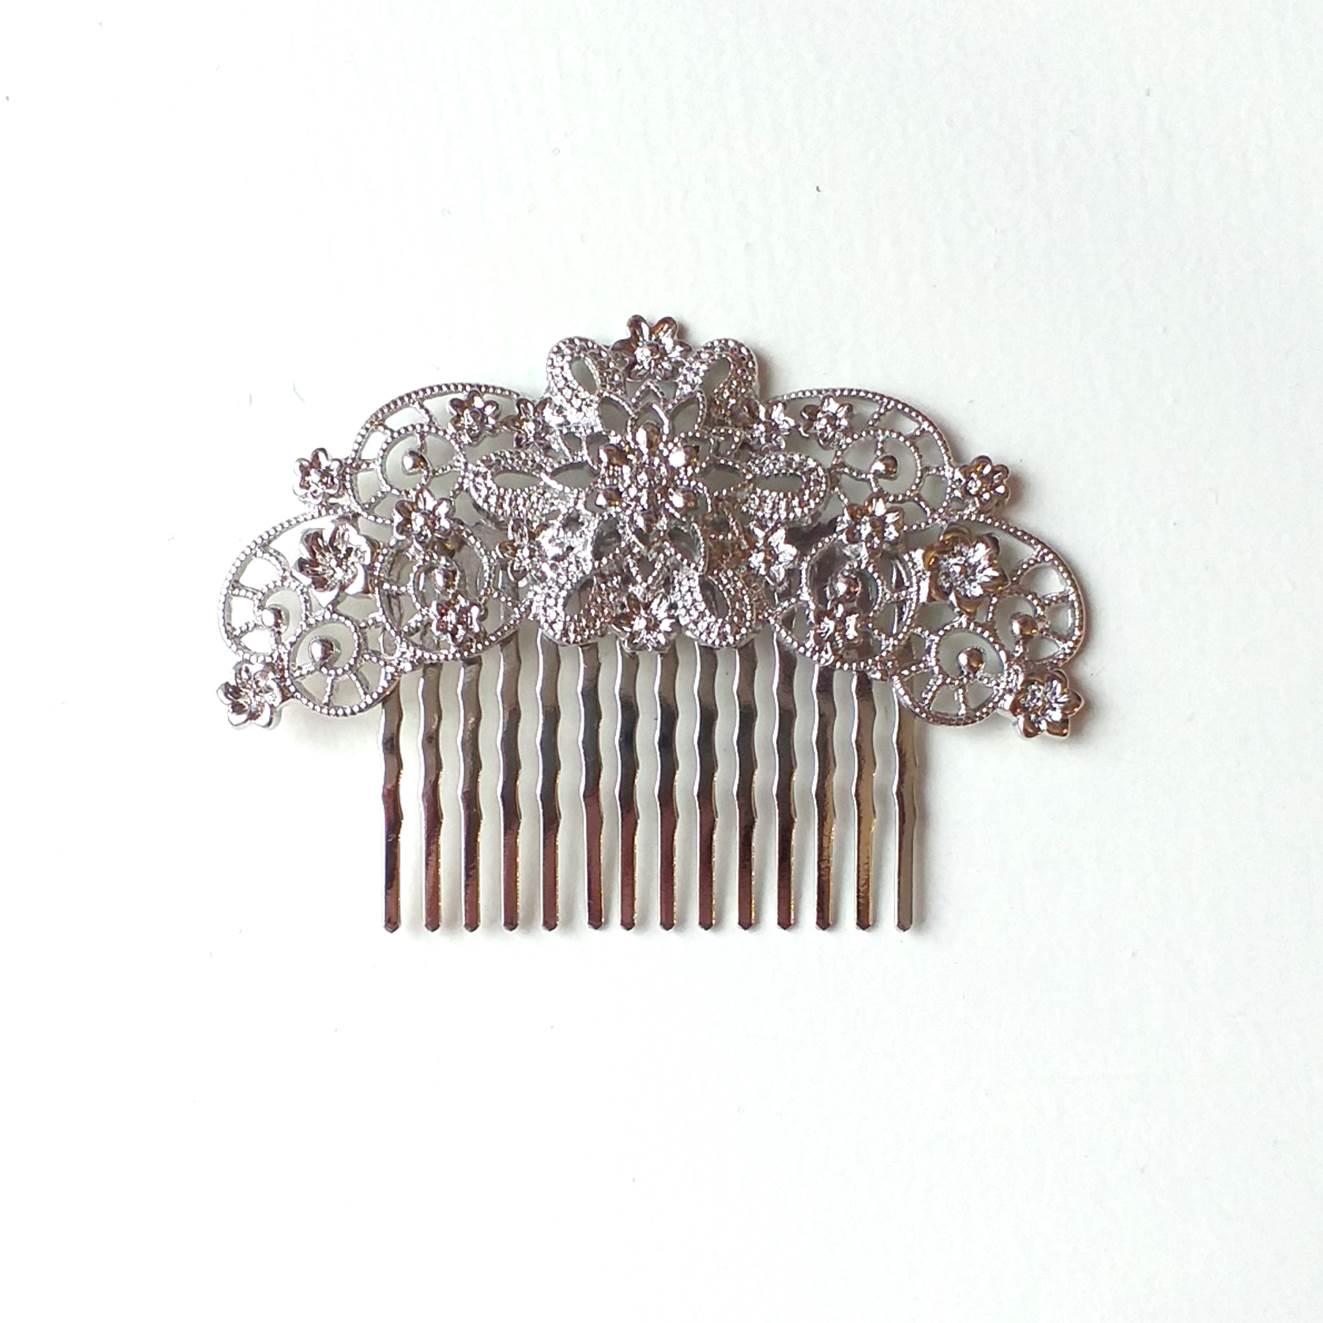 PEINECILLO metal flamenco vintage prateado  7,5cmx5,5cm arco